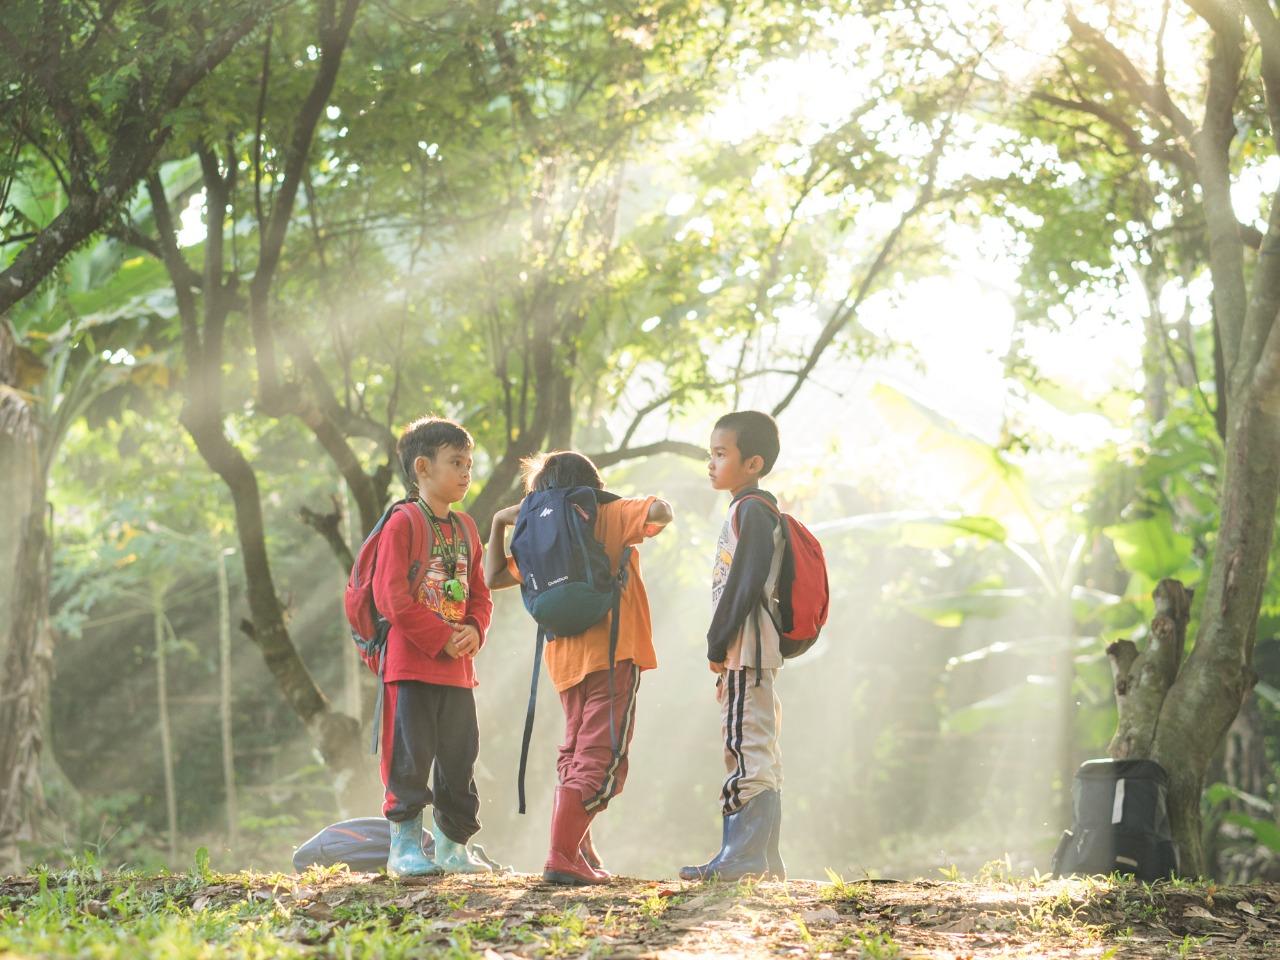 volunteer project: Indonesia School of Nature photo 2